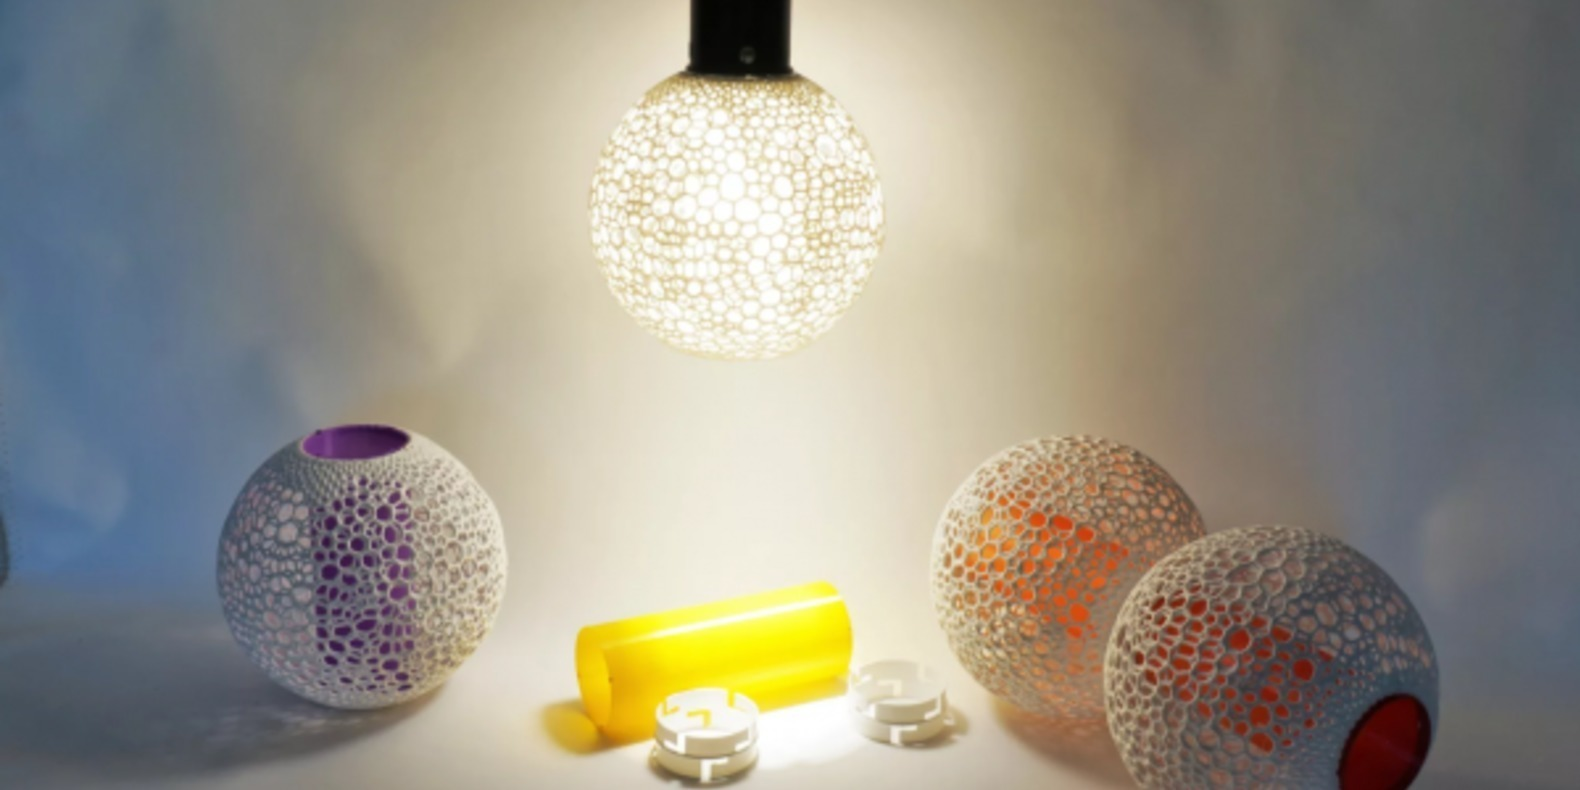 lampe sino makemakemake impression 3D fichier 3D cults 1